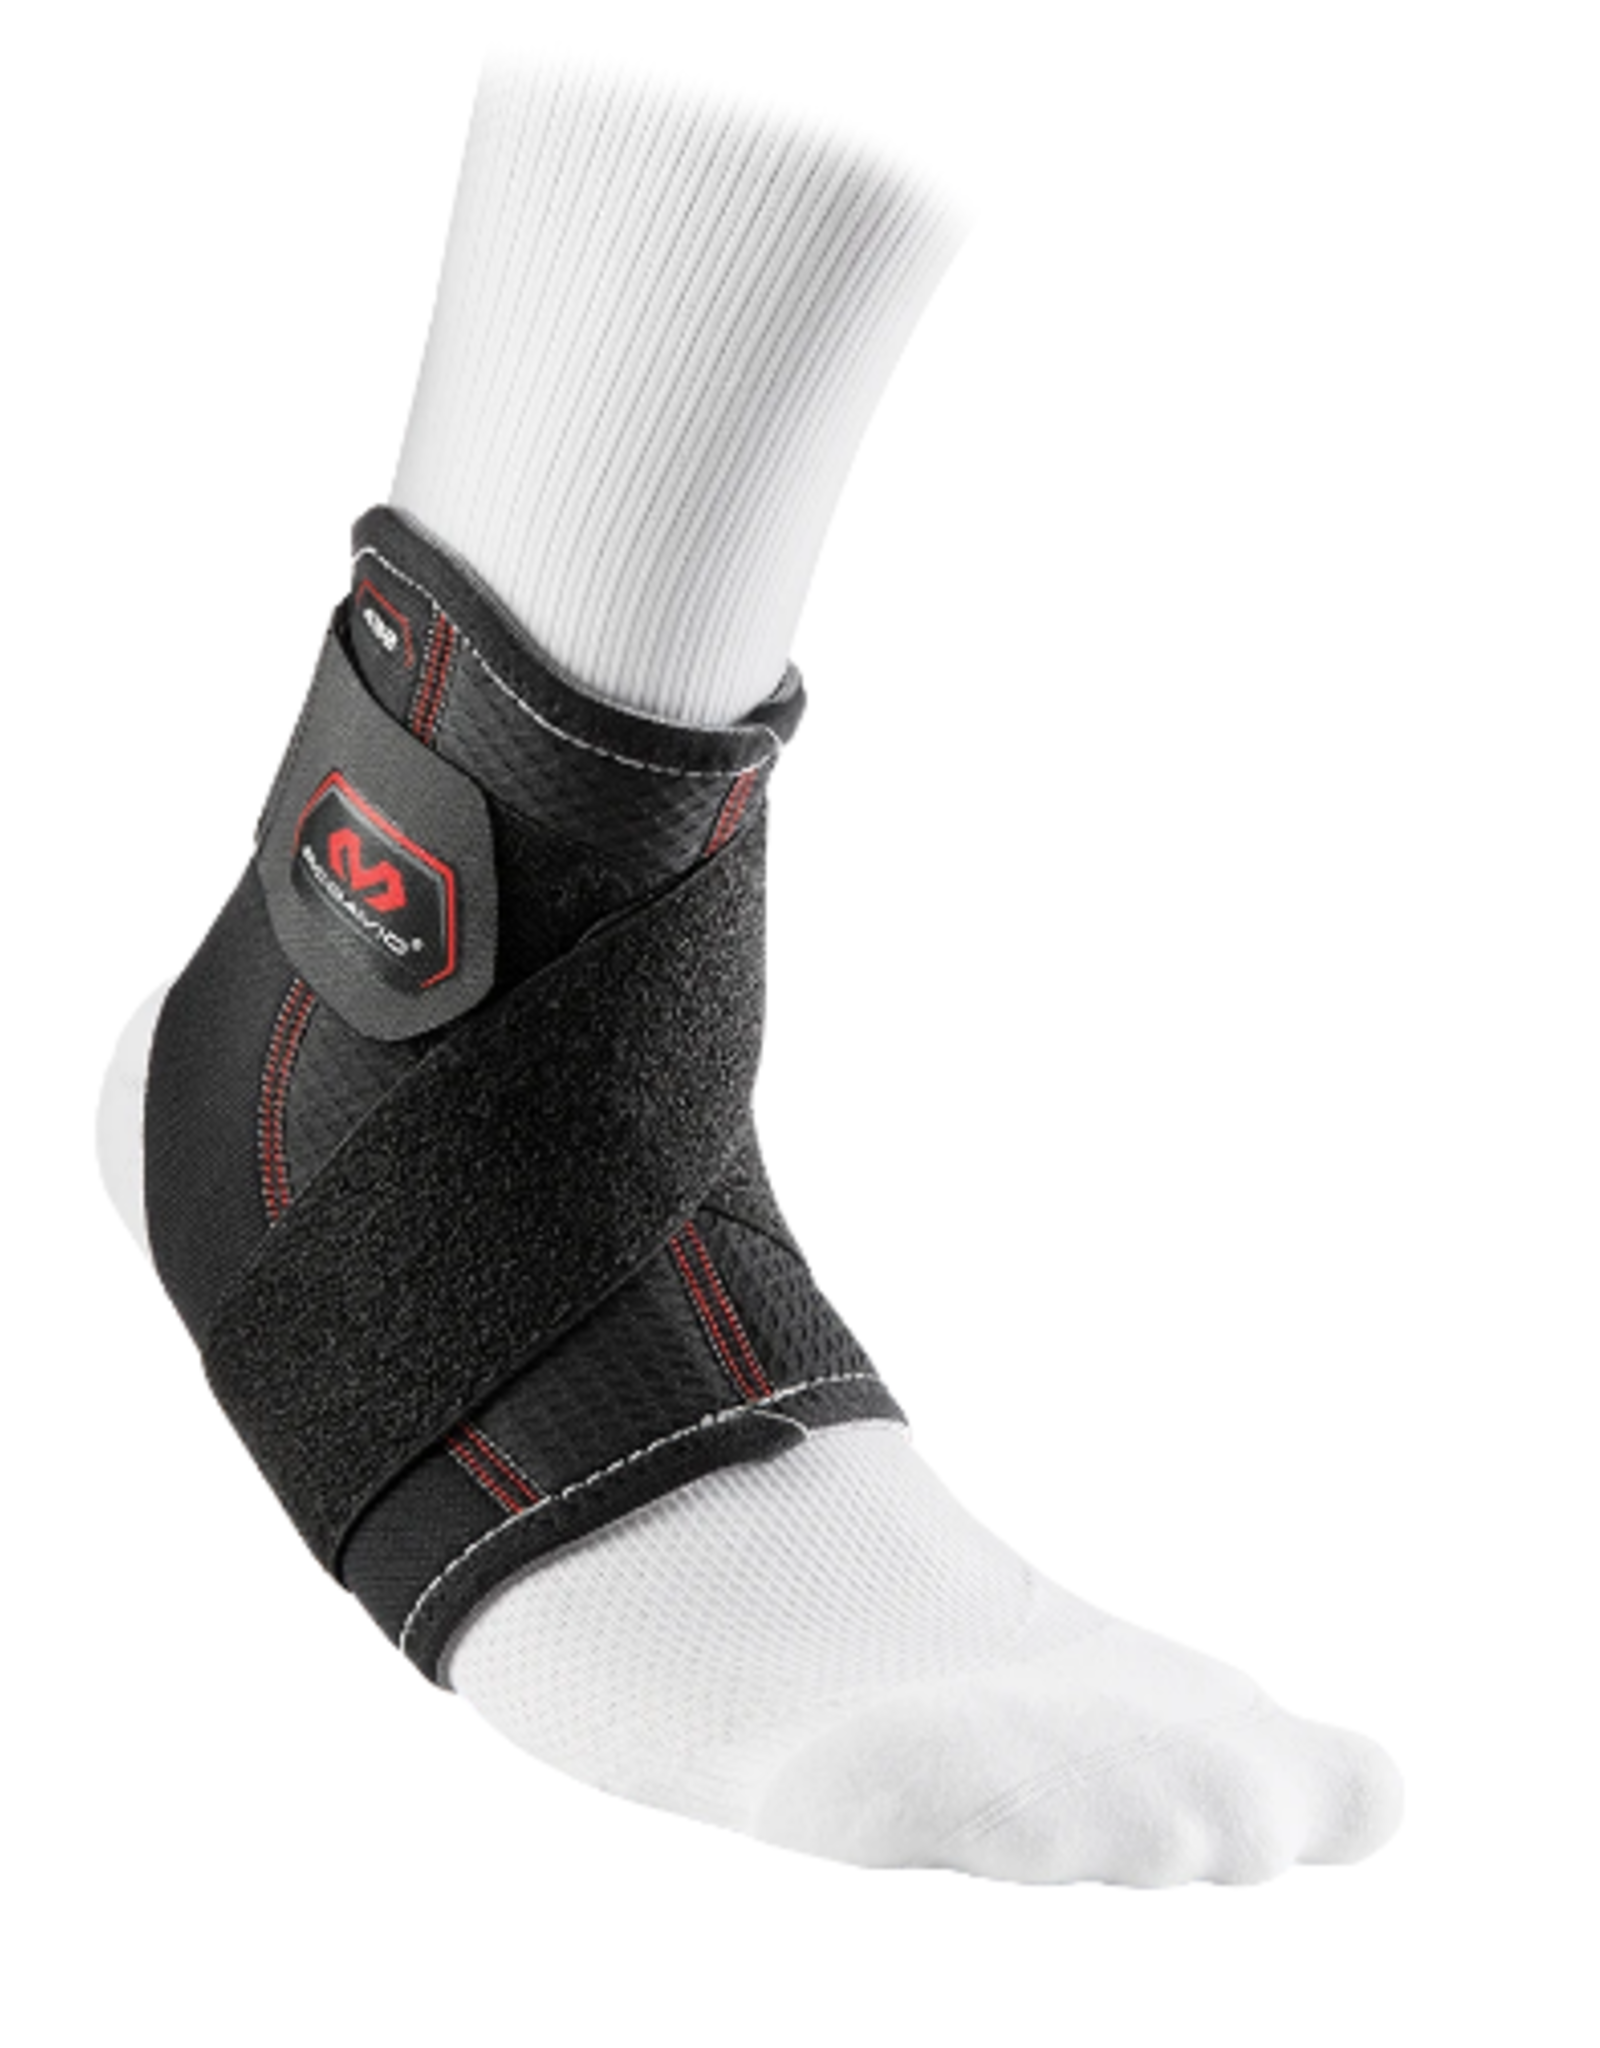 McDavid Compressionsport.com Level 2 Ankle Support w/Figure 8 Straps Blk S